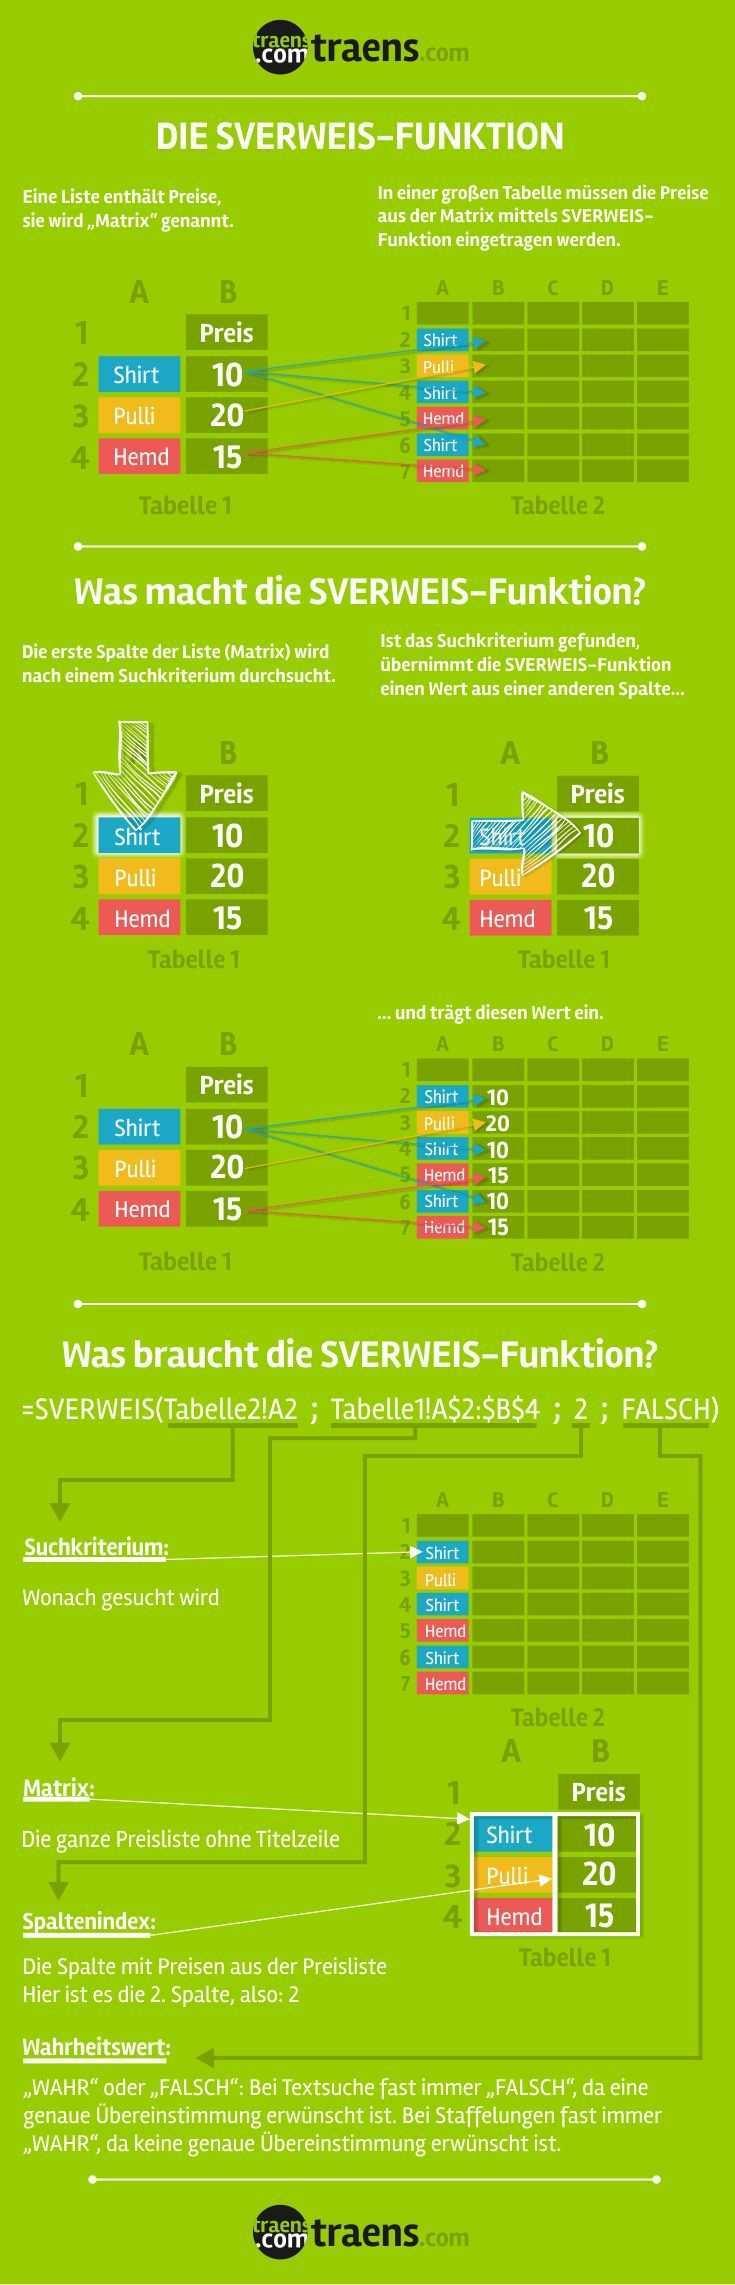 Excel Sverweis Infografik Excel Industrial Infografik Sverweis Excel Tutorials Infographic Microsoft Excel